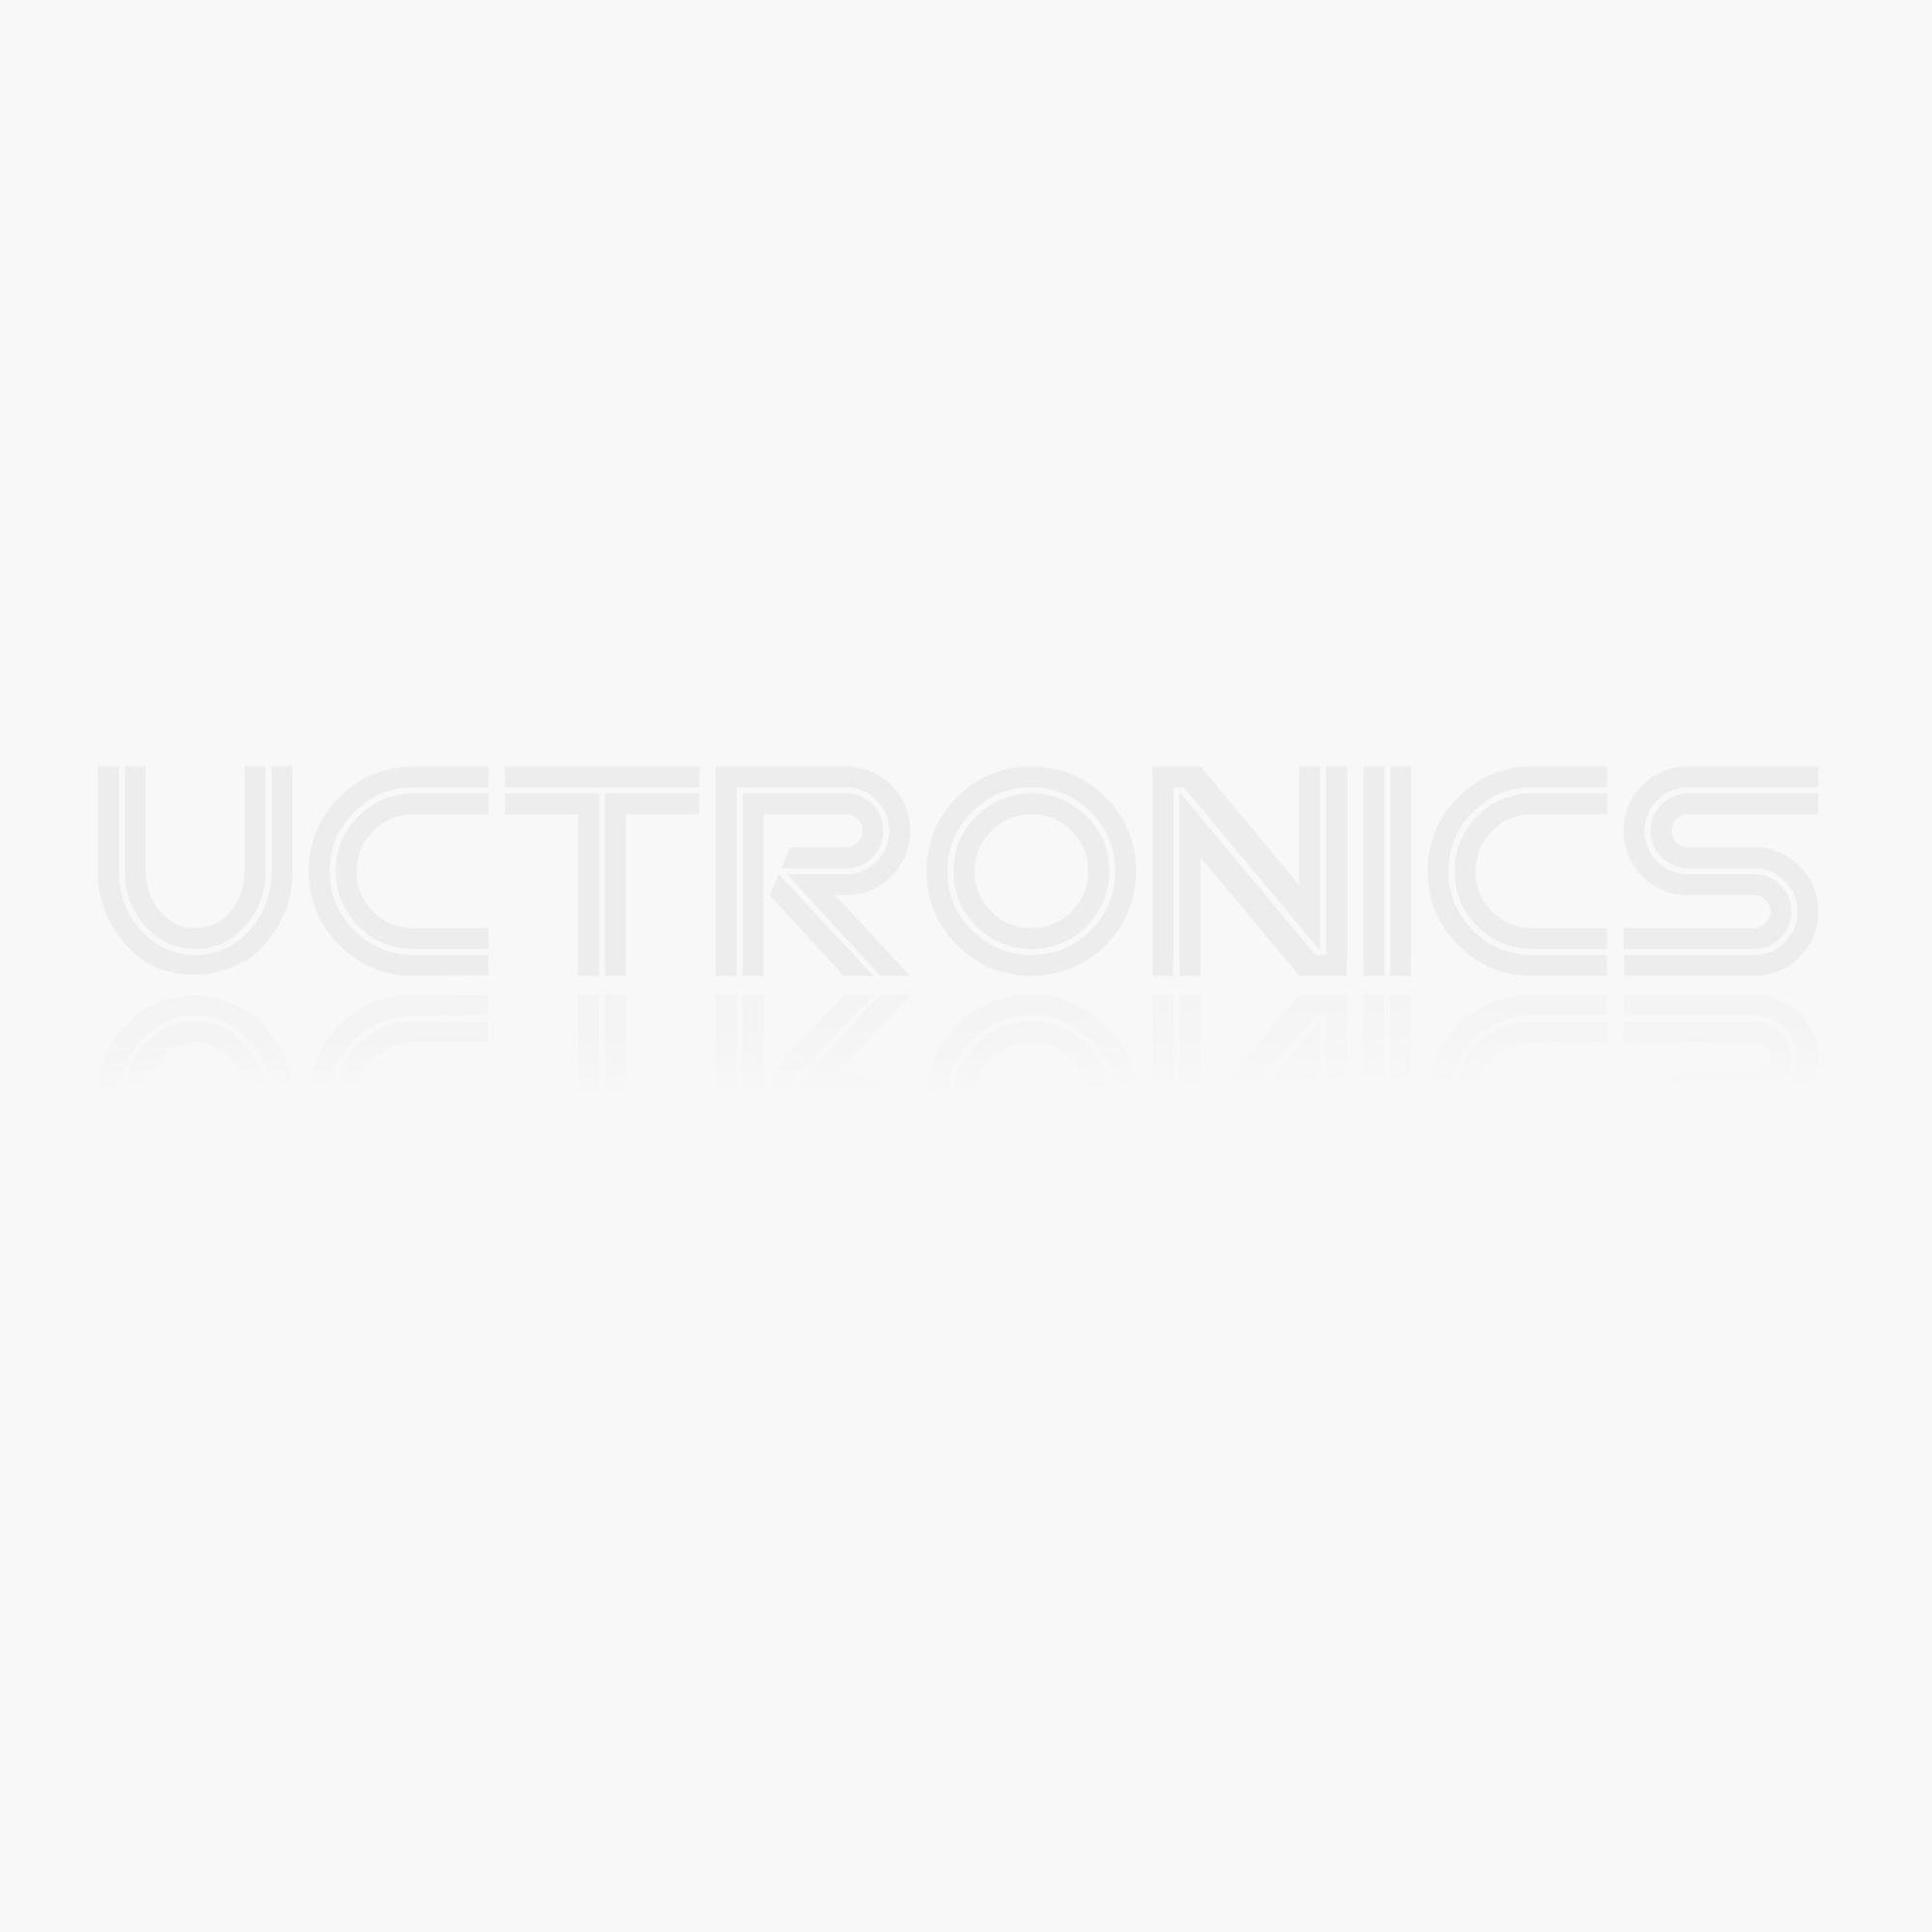 Arducam 0.36MP USB Camera Evaluation Kit - CMOS MT9V022 1/3-Inch Monochrome Camera Module with USB Camera Shield